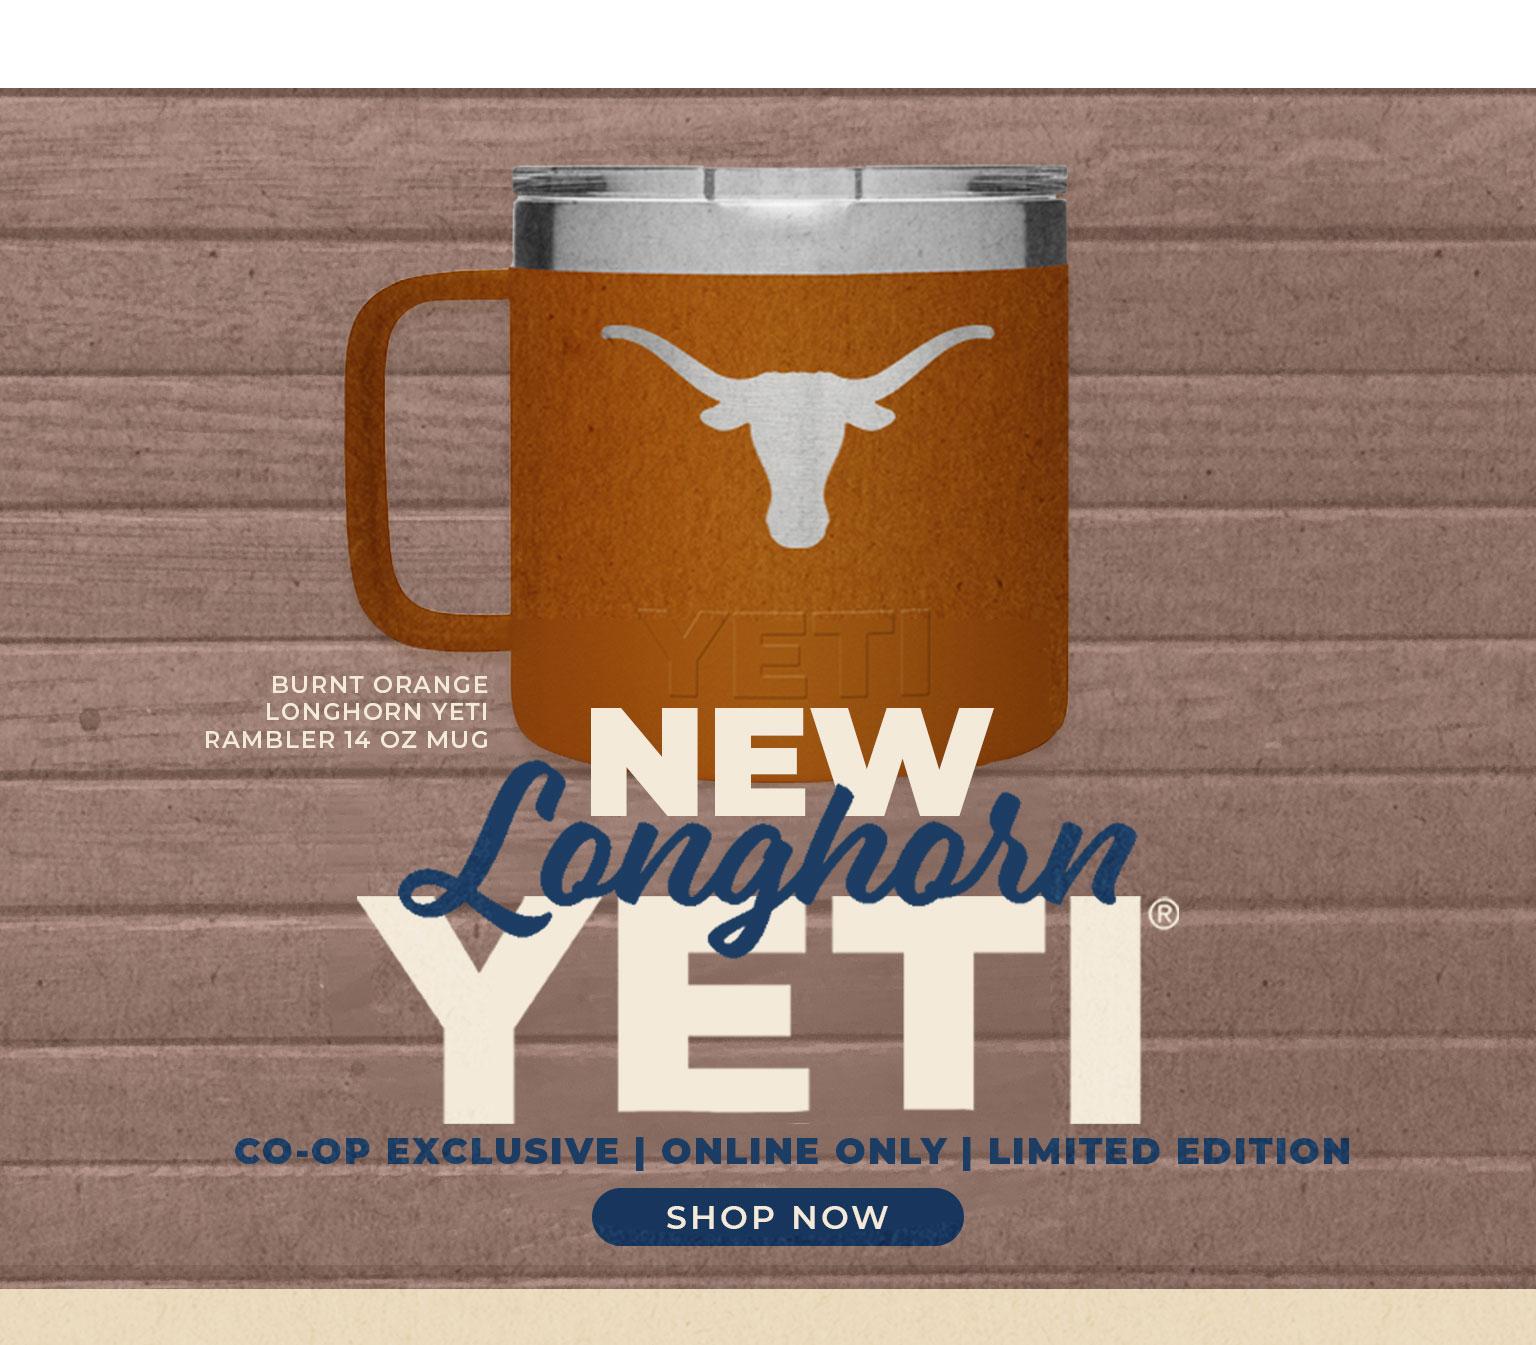 Get Your New Burnt Orange Longhorn Yeti Rambler 14oz Mug!